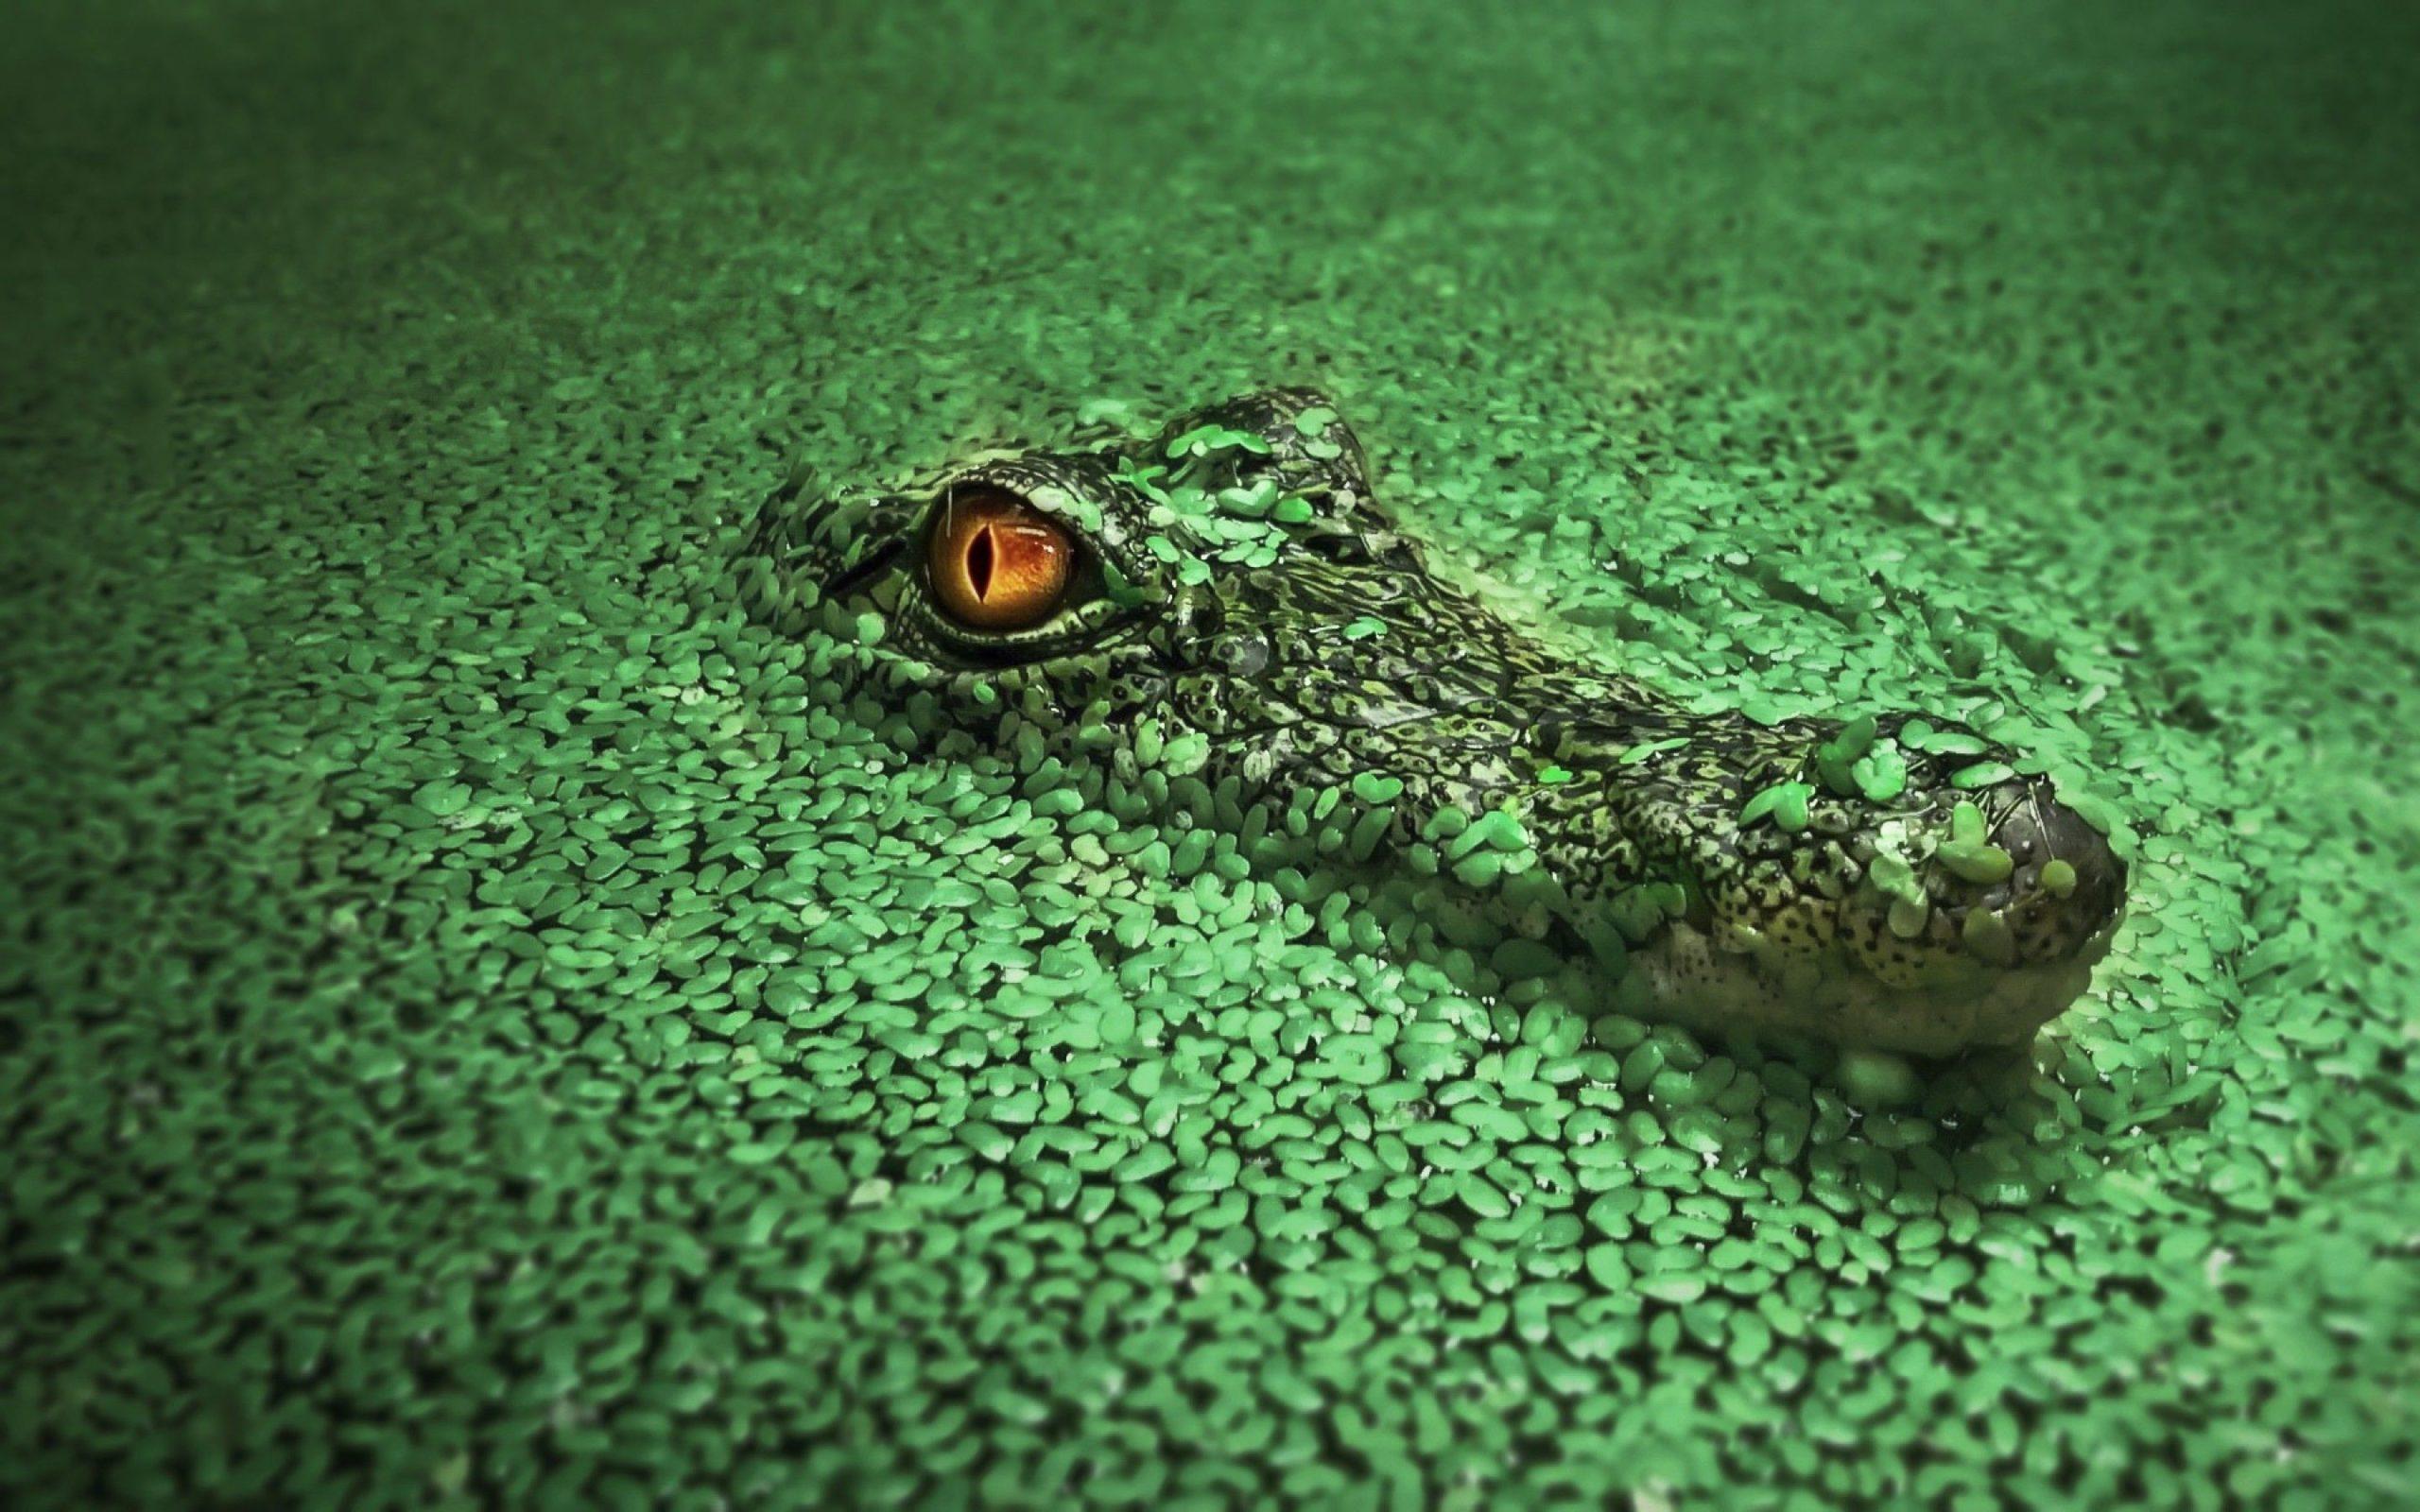 show me a picture of a crocodile